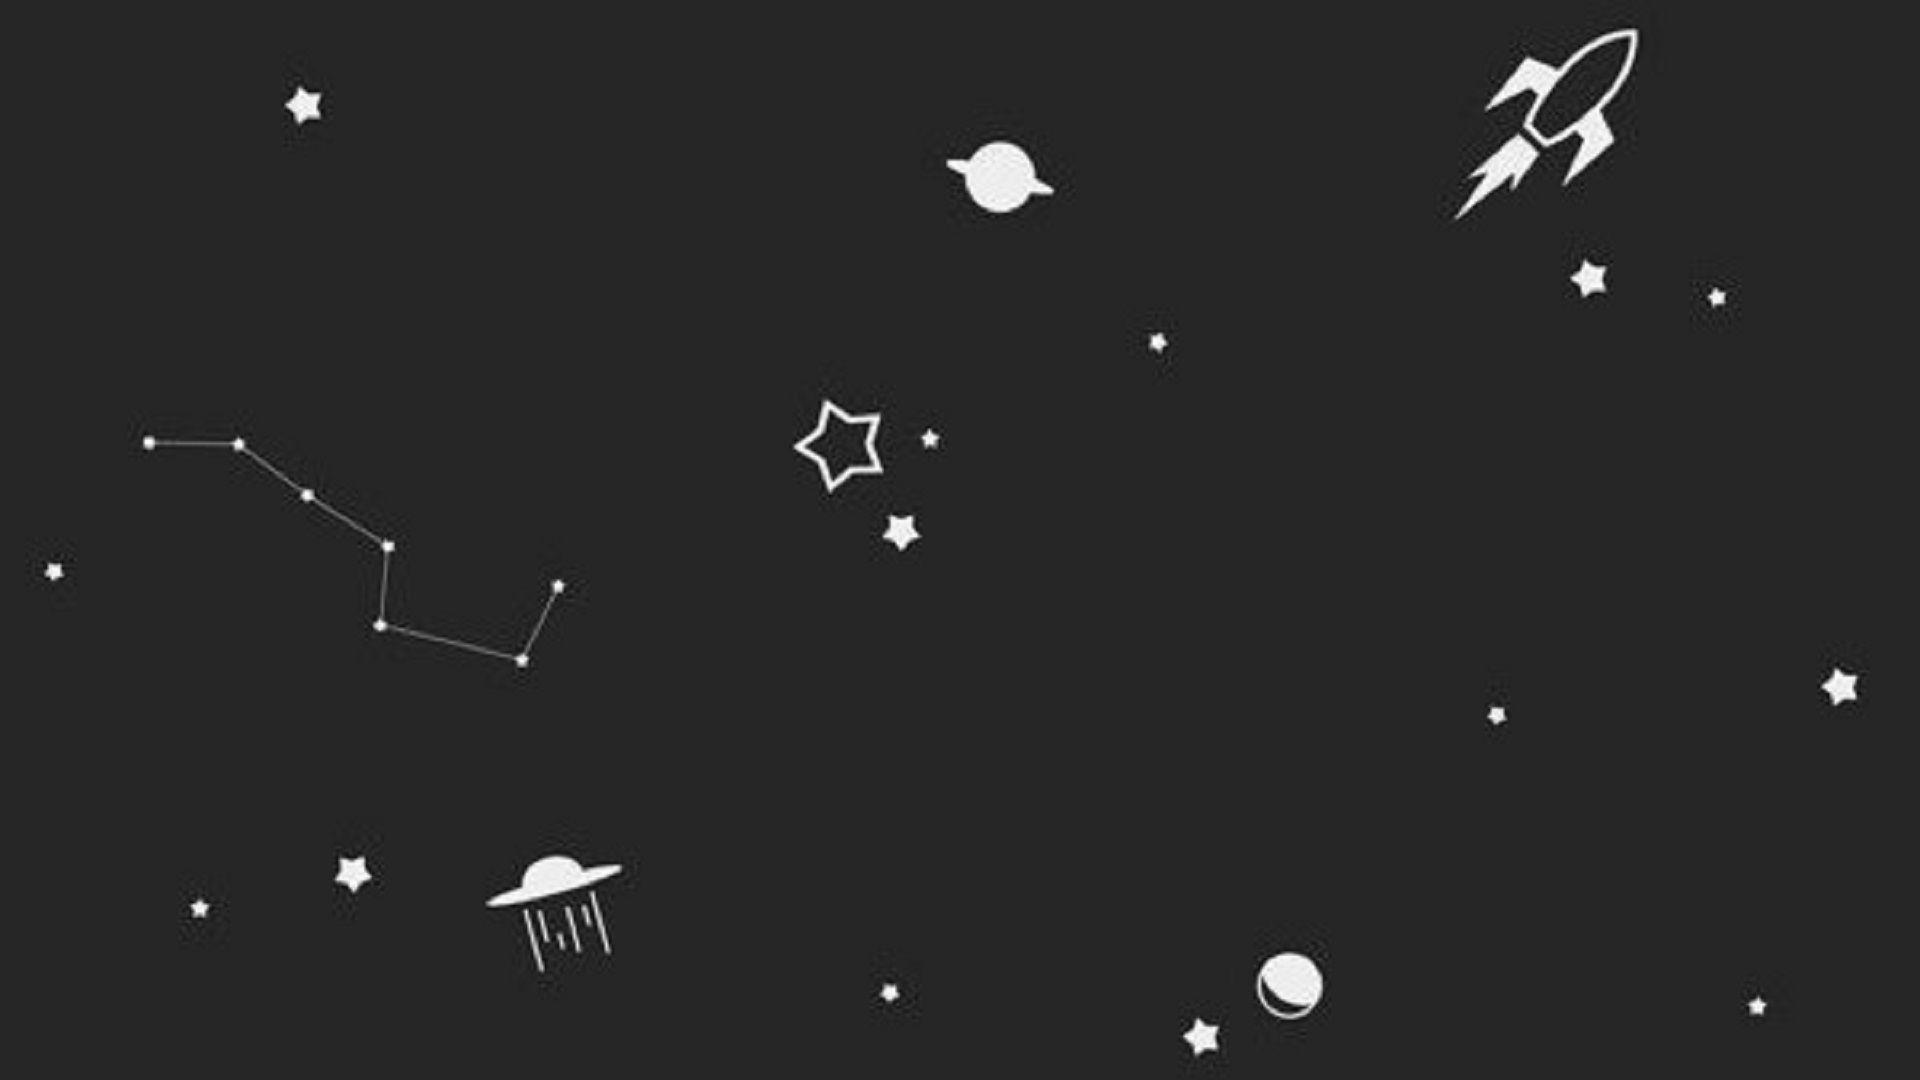 Aesthetic Tumblr Laptop Wallpapers   Top Aesthetic Tumblr 1920x1080